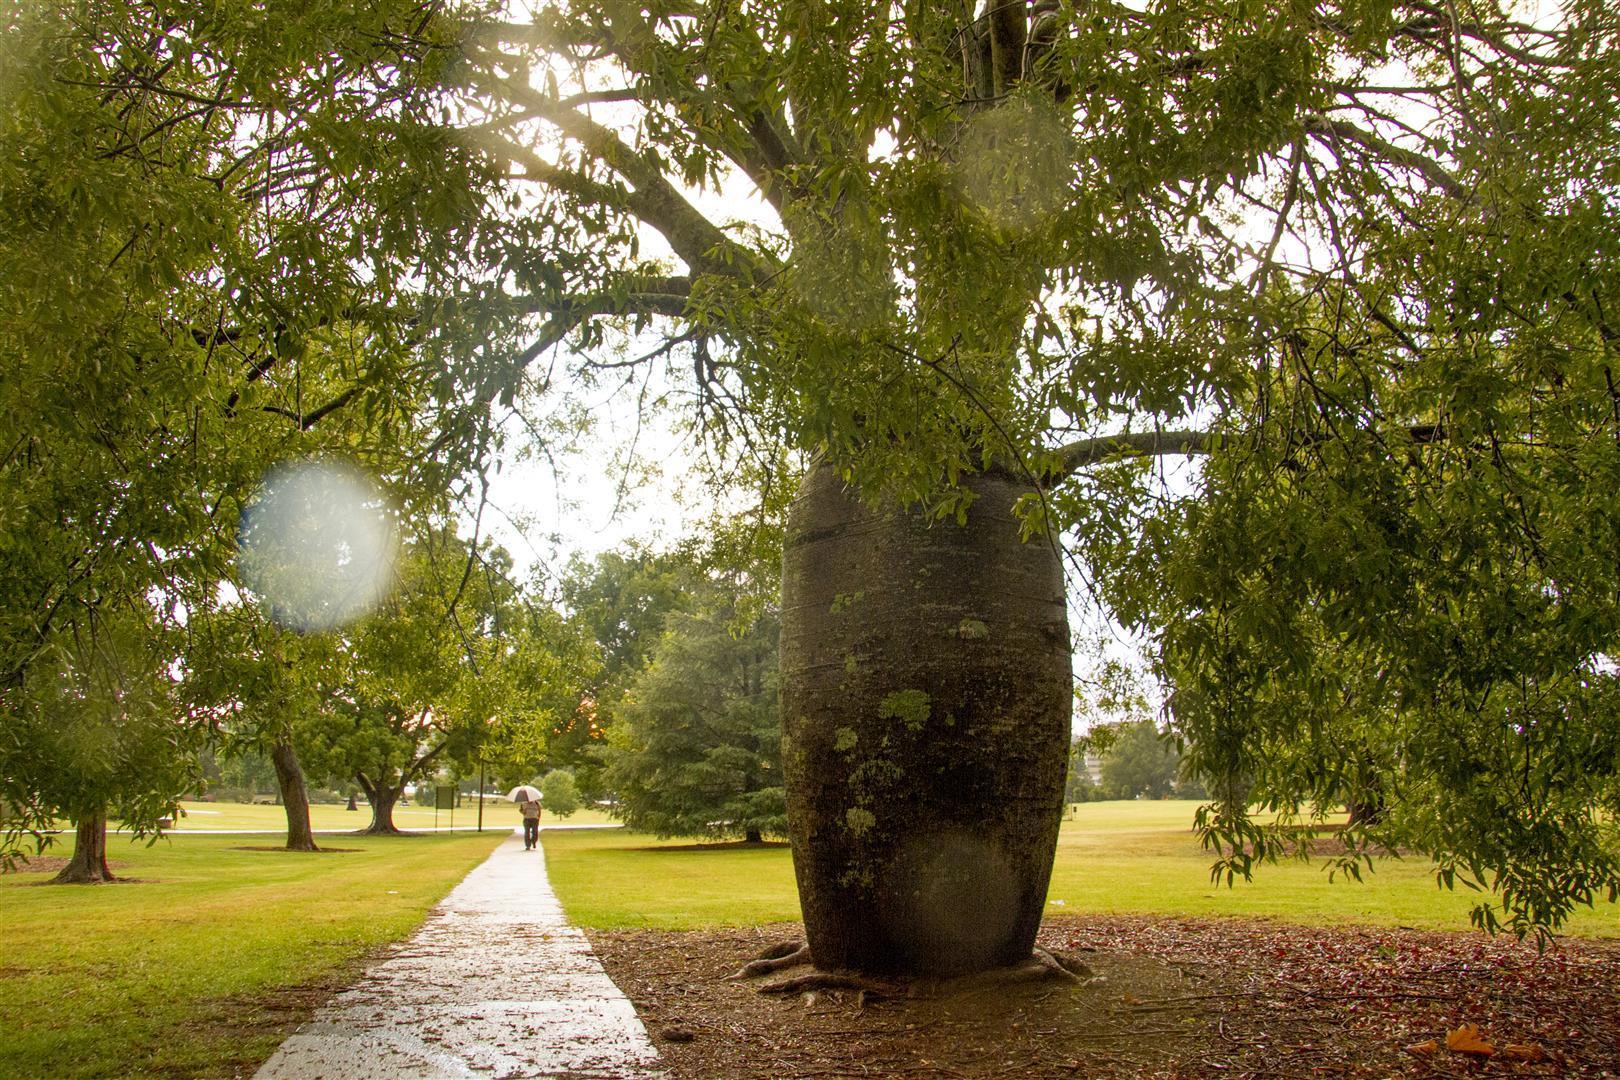 Kurrajong, Queens Park, Toowoomba.